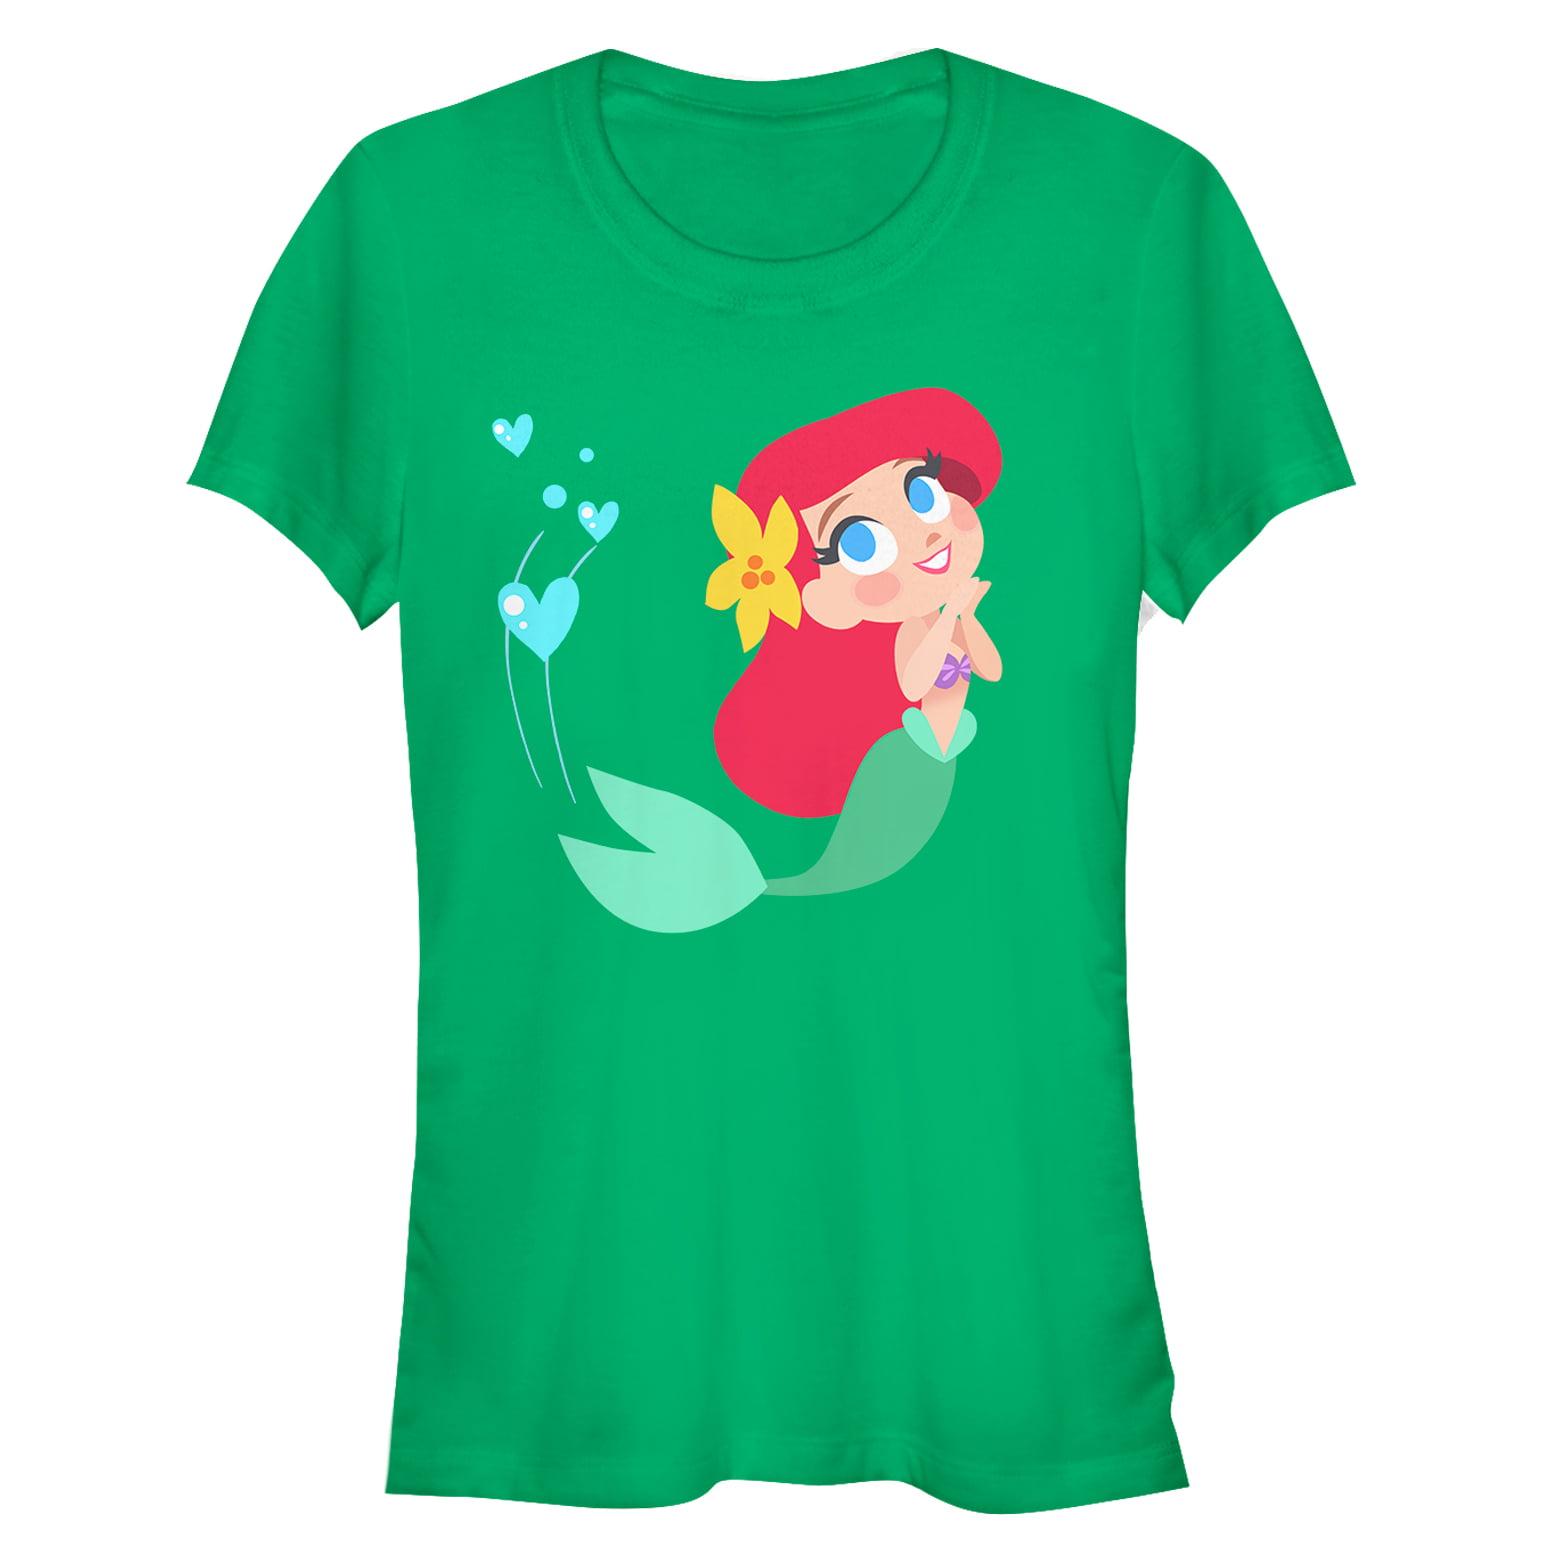 The Little Mermaid Juniors' Ariel Love T-Shirt